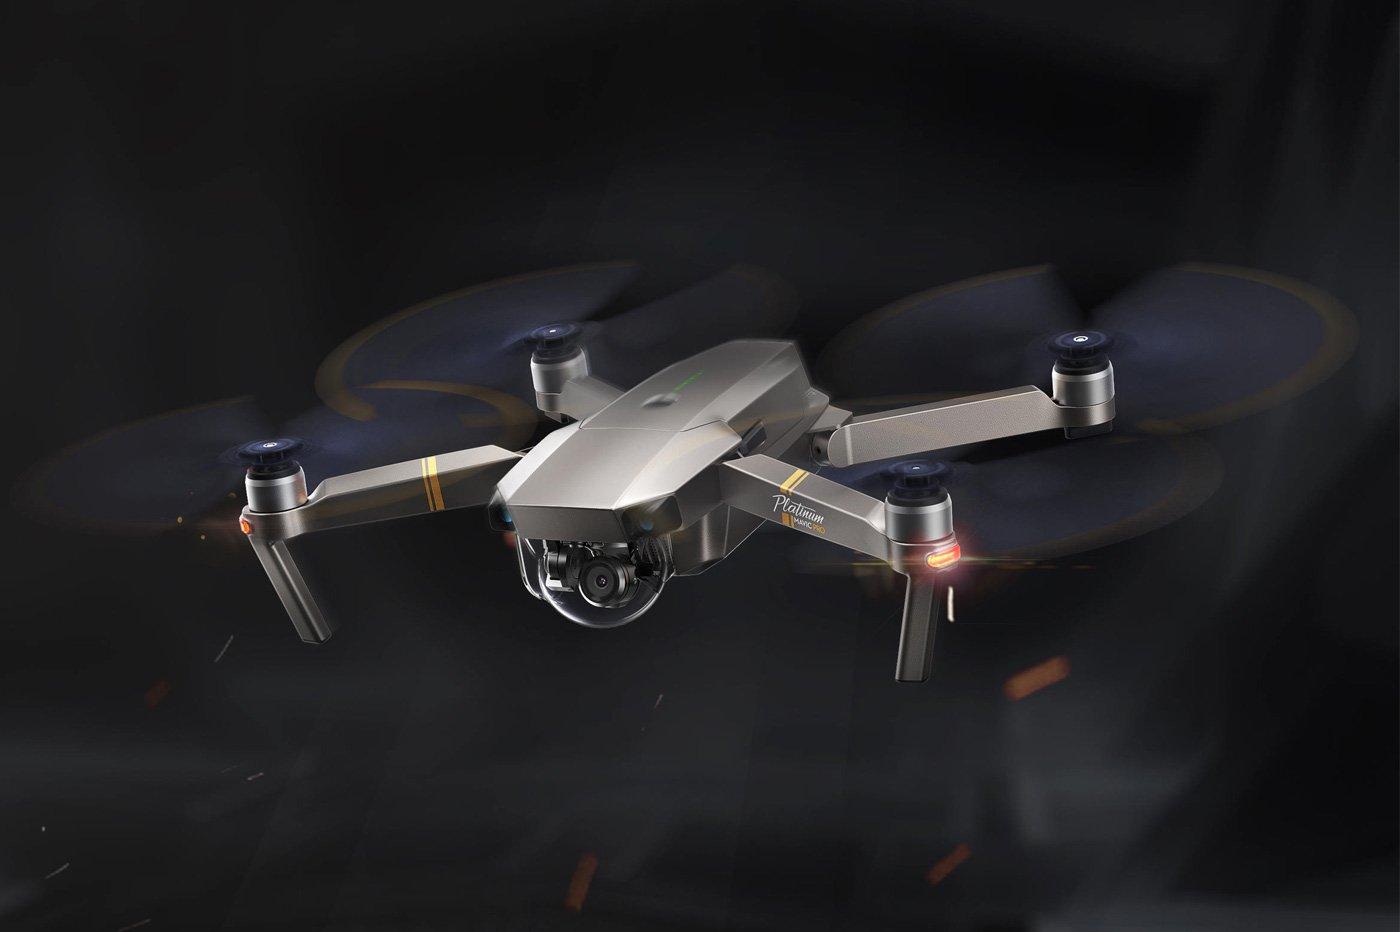 dji va lancer un in u00e9dit drone de course fpv pilot u00e9 par